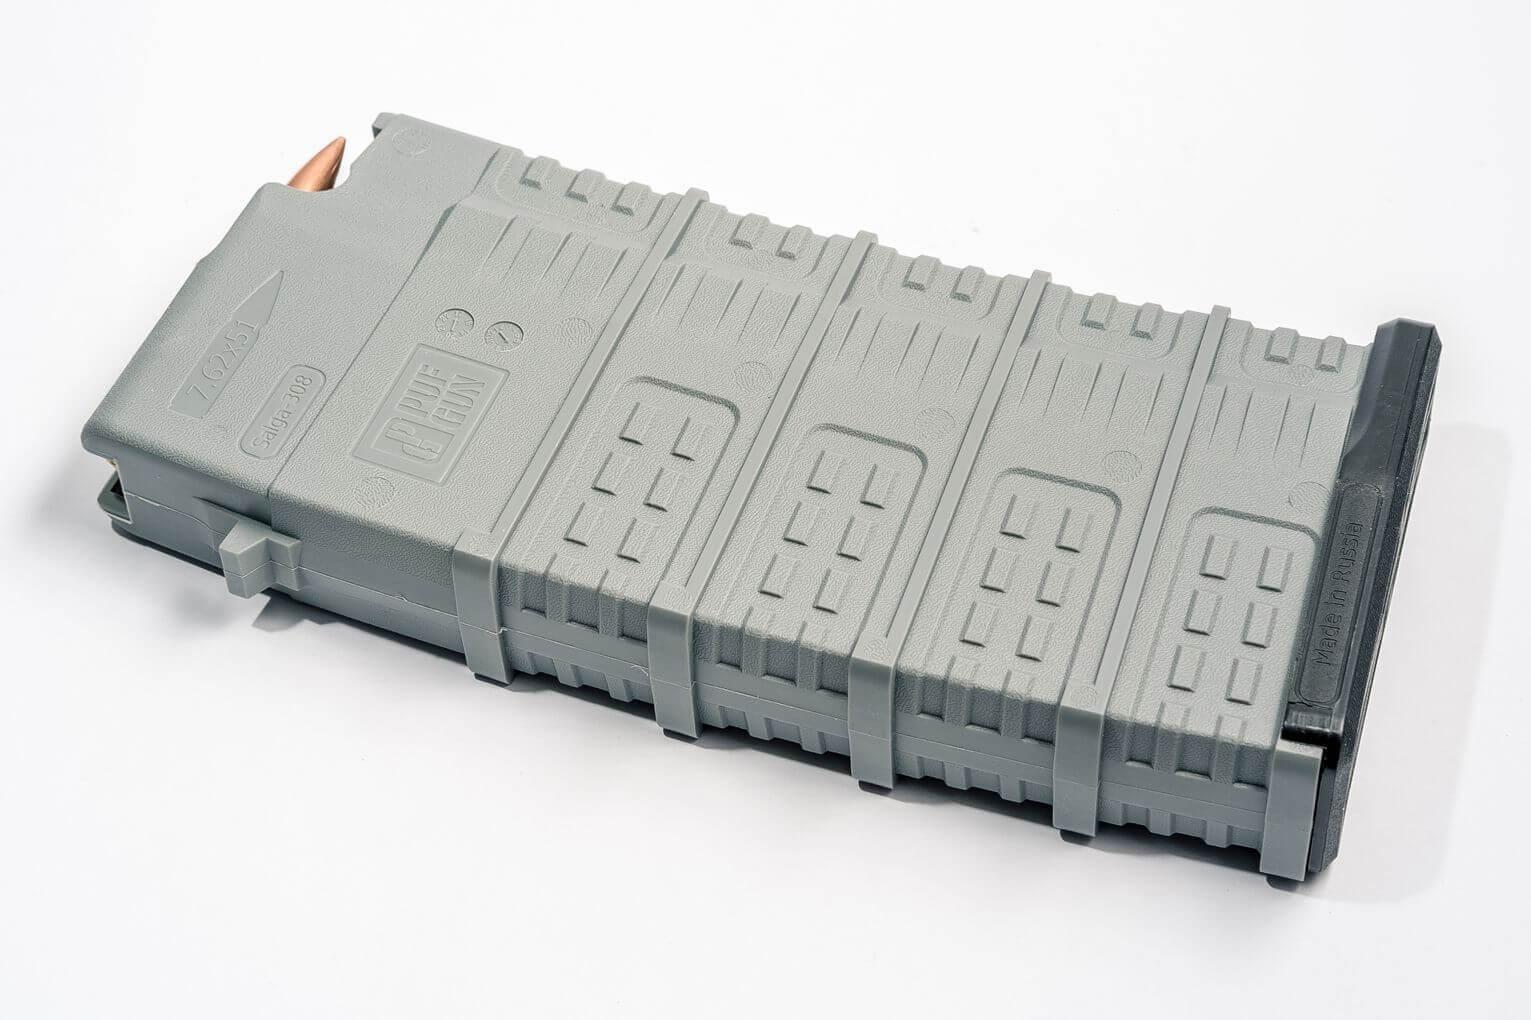 Магазин Pufgun Сайга-308 на 25 патронов, серый